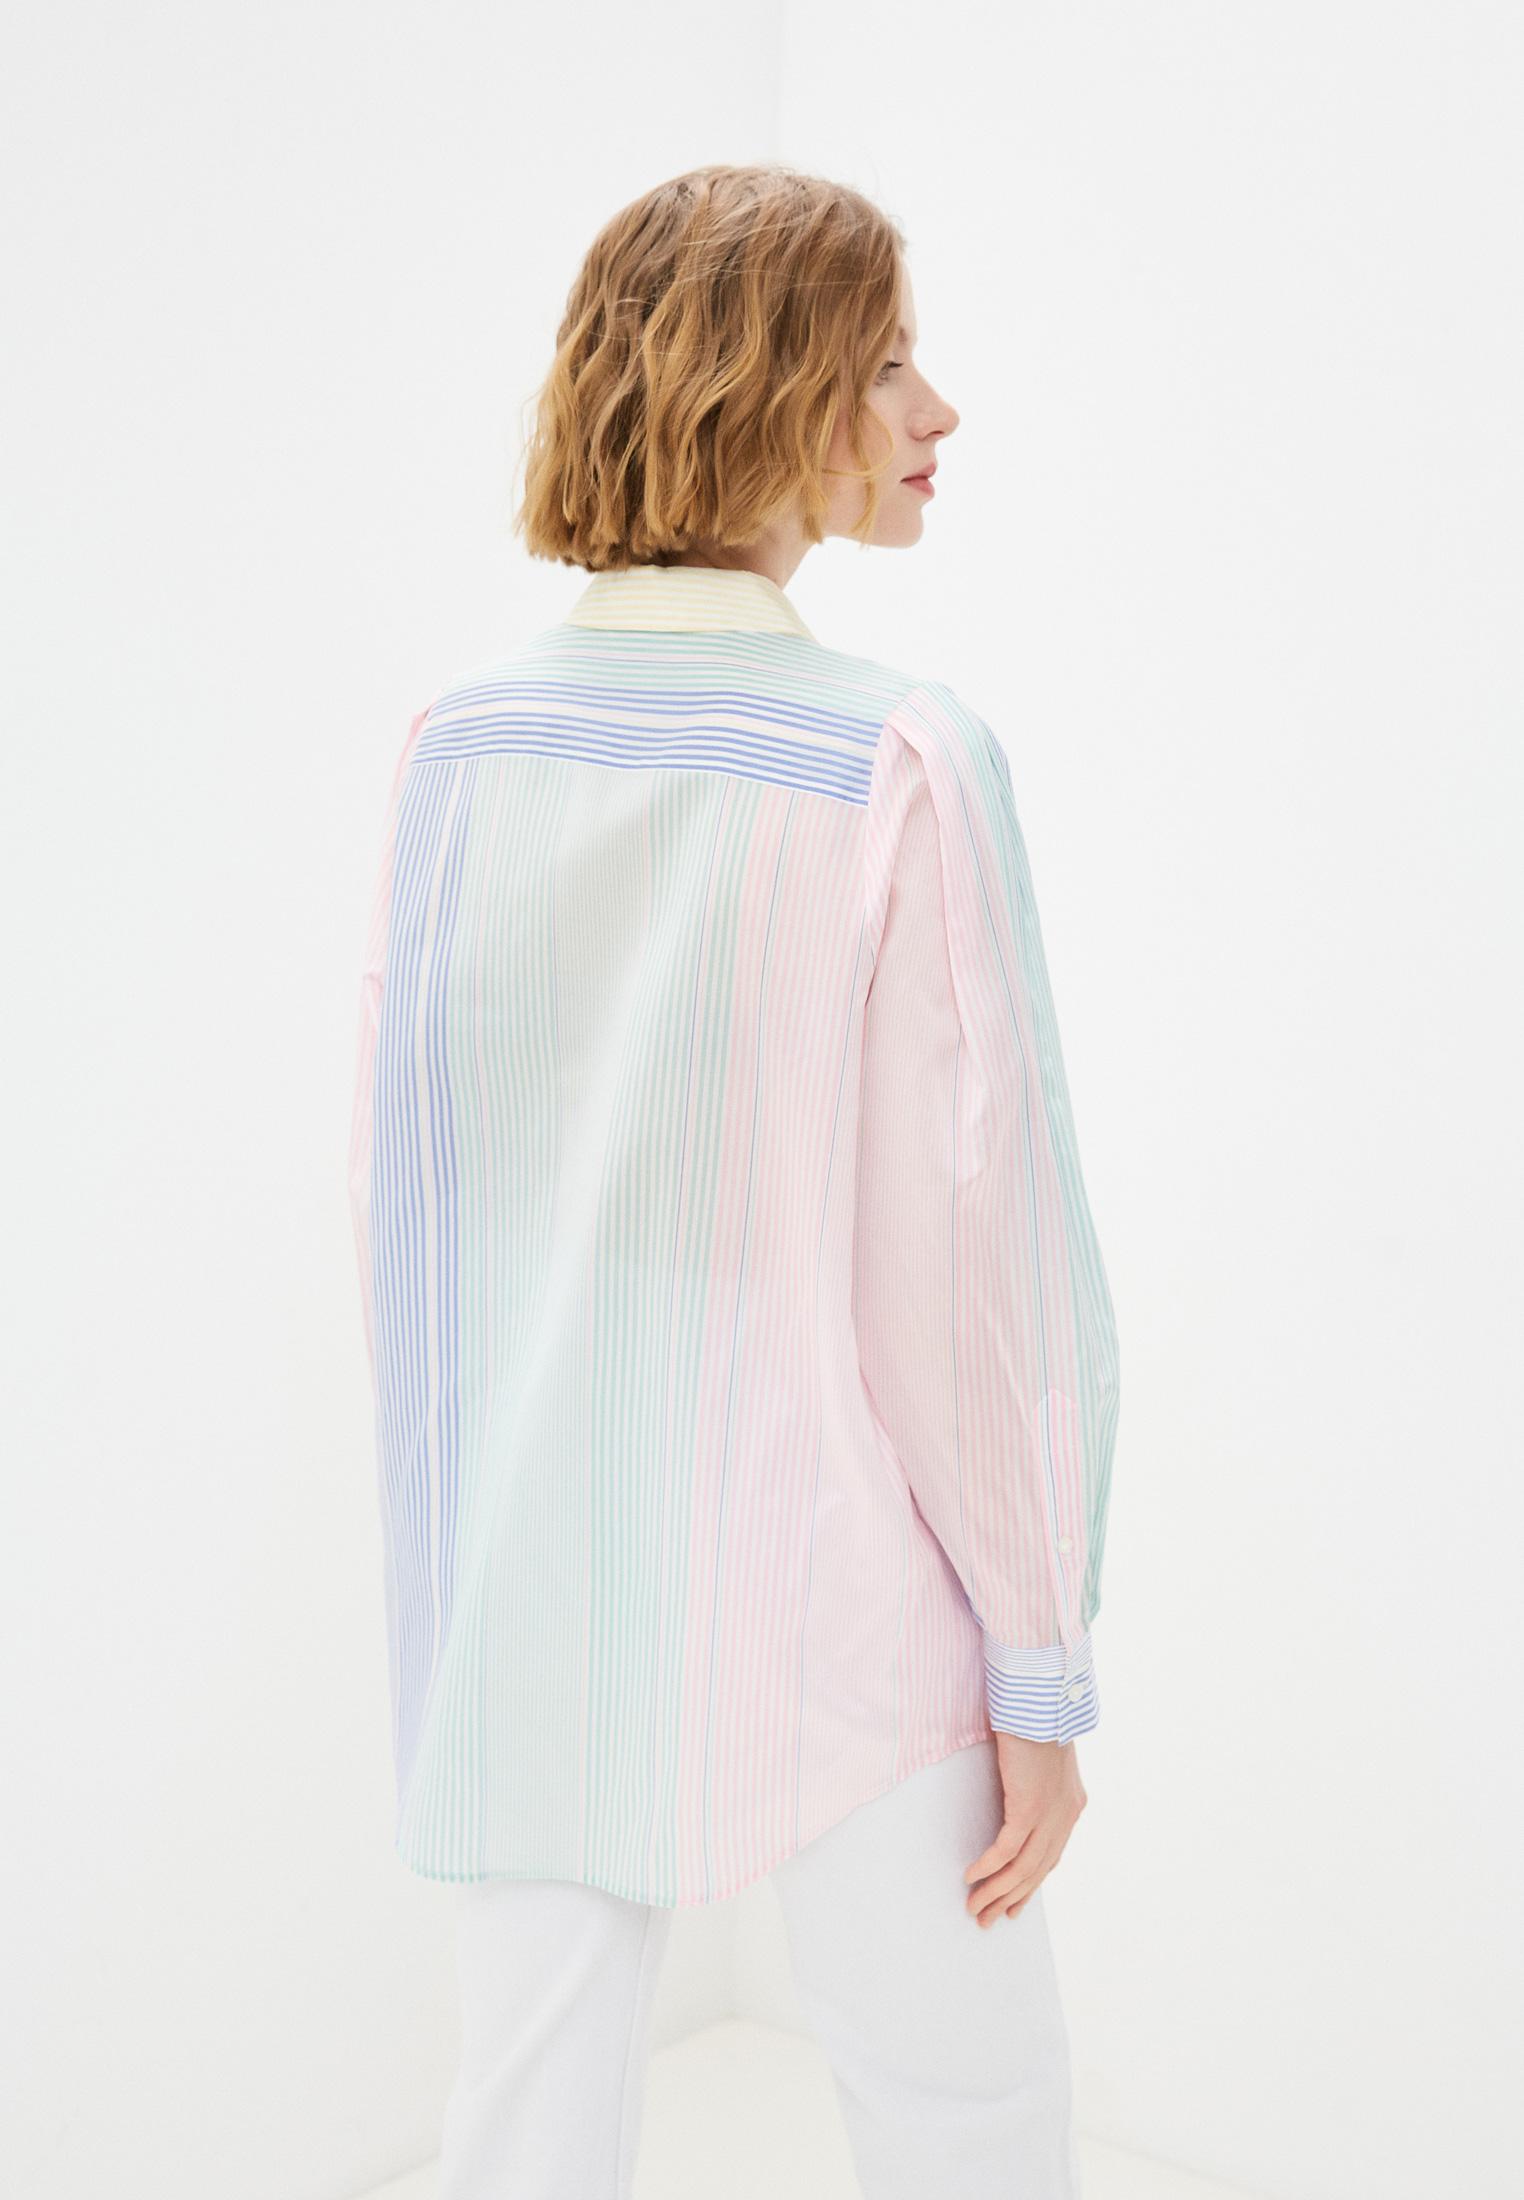 Блуза Tommy Hilfiger (Томми Хилфигер) WW0WW30936: изображение 2